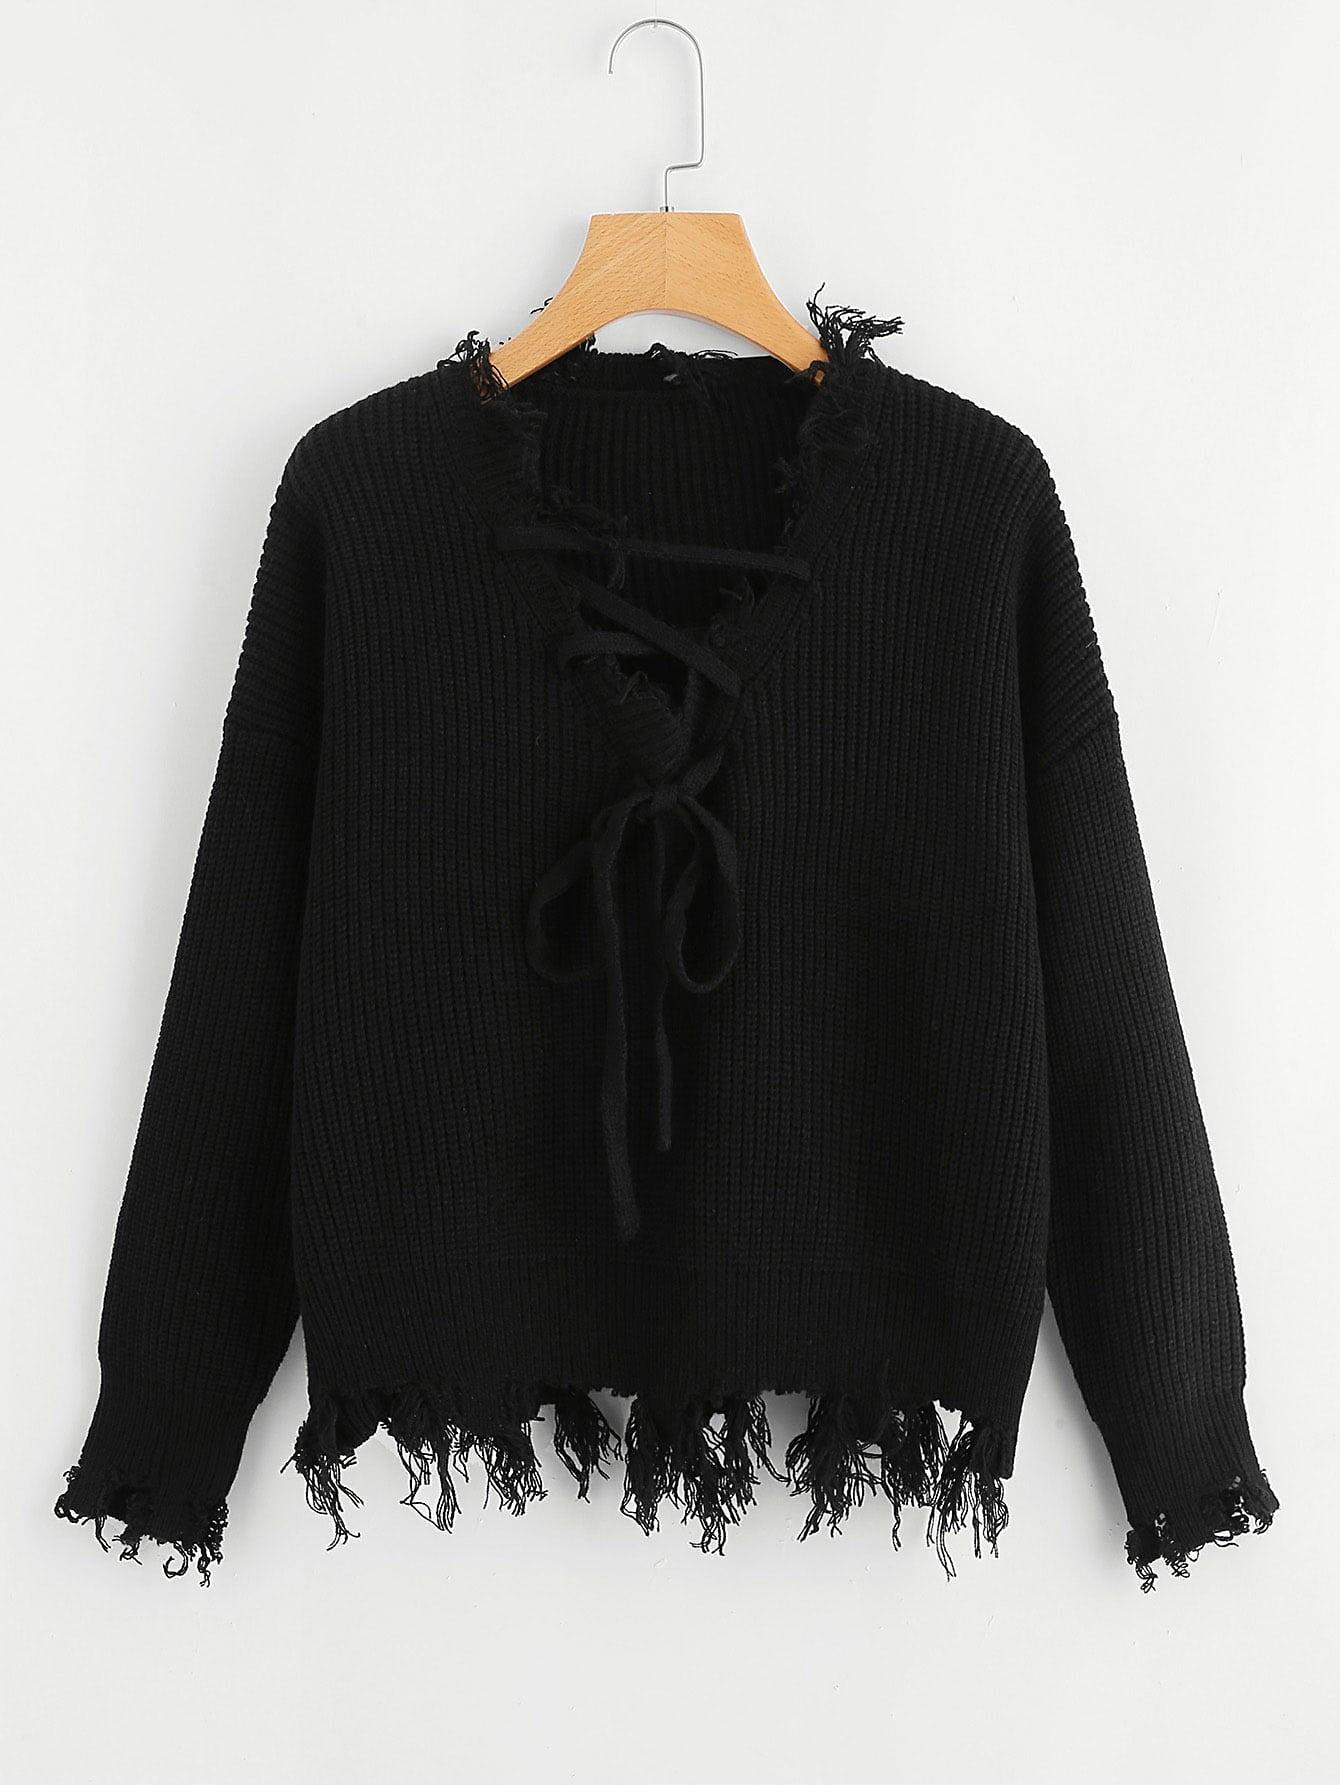 Купить Твердый свитер спереди бант, null, SheIn